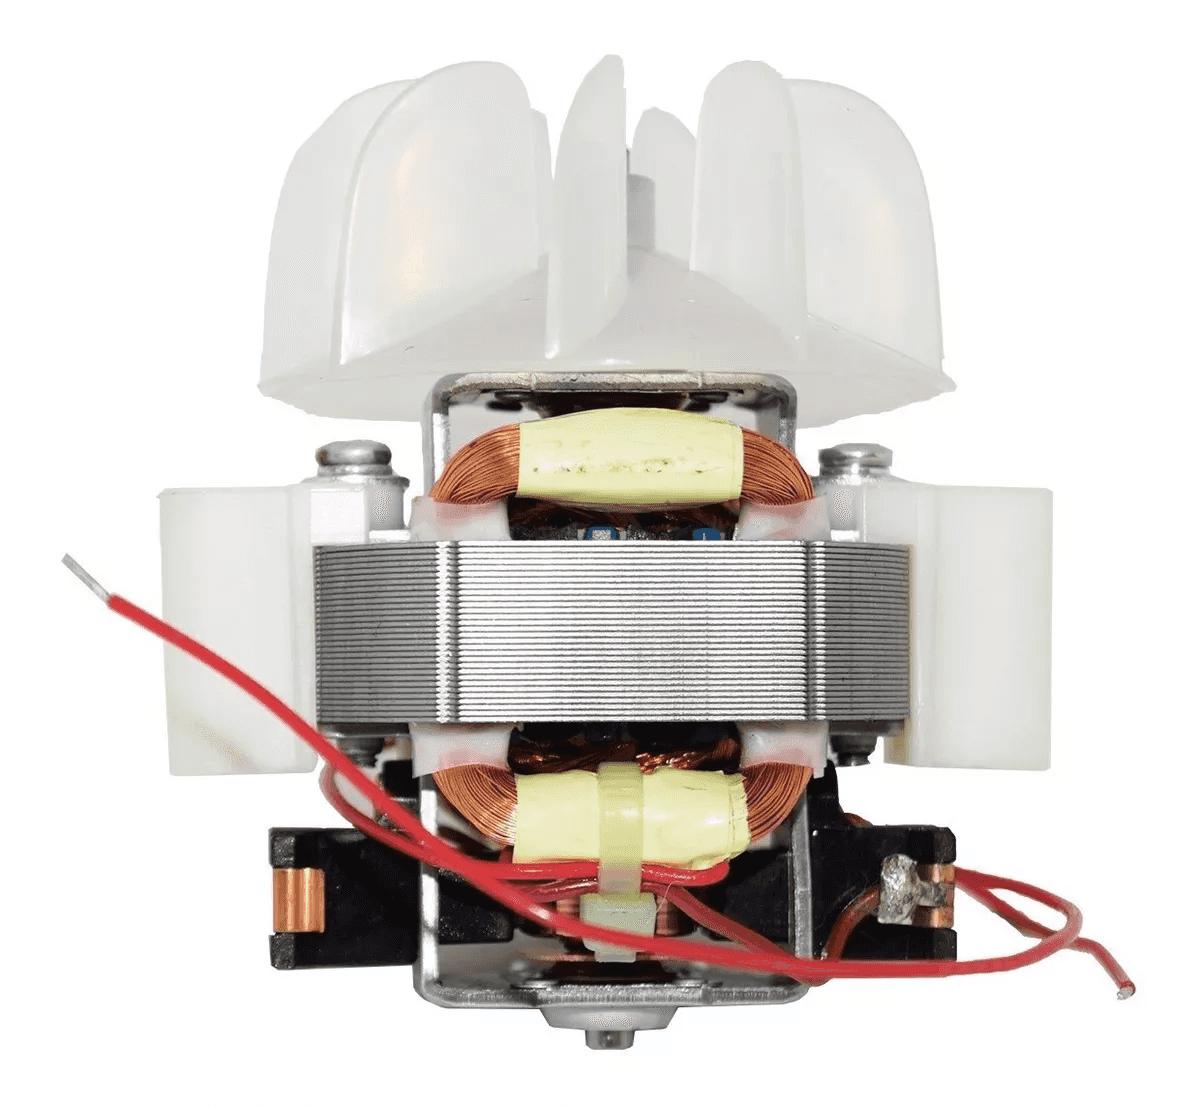 Motor Secador de Cabelo Taiff 2400 / 2600 W